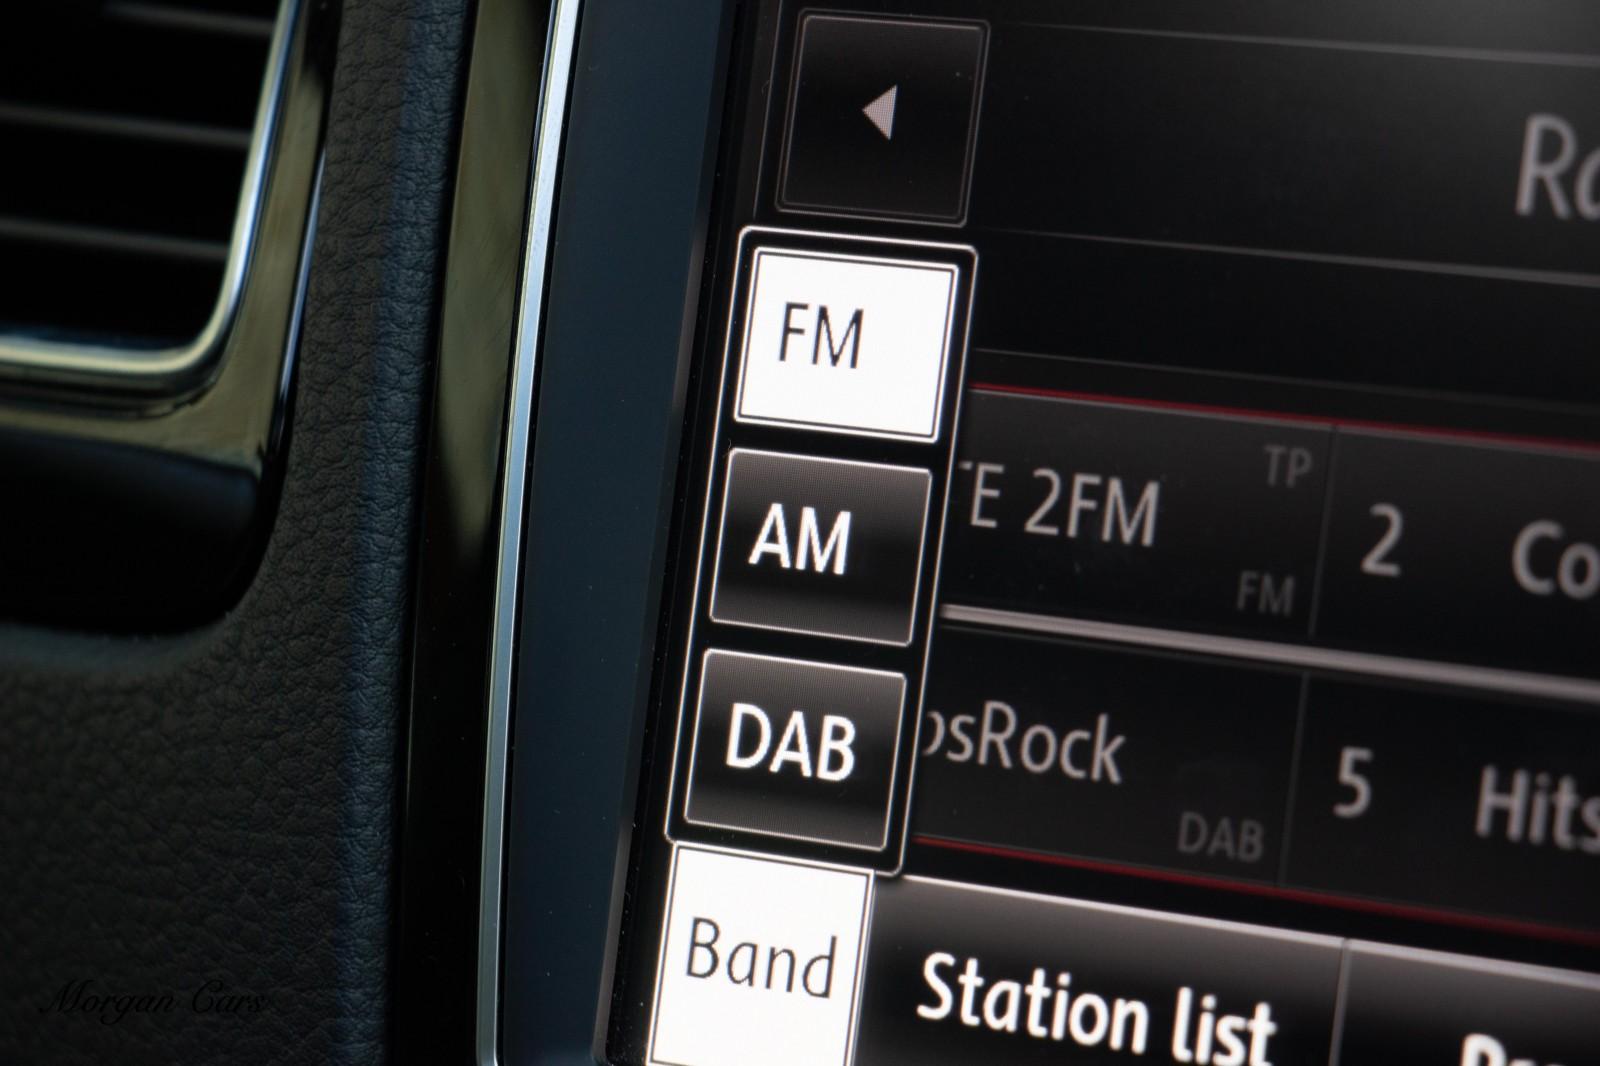 2016 Volkswagen Touareg V6 R-LINE TDI BLUEMOTION TECHNOLOGY Diesel Automatic – Morgan Cars 9 Mound Road, Warrenpoint, Newry BT34 3LW, UK full